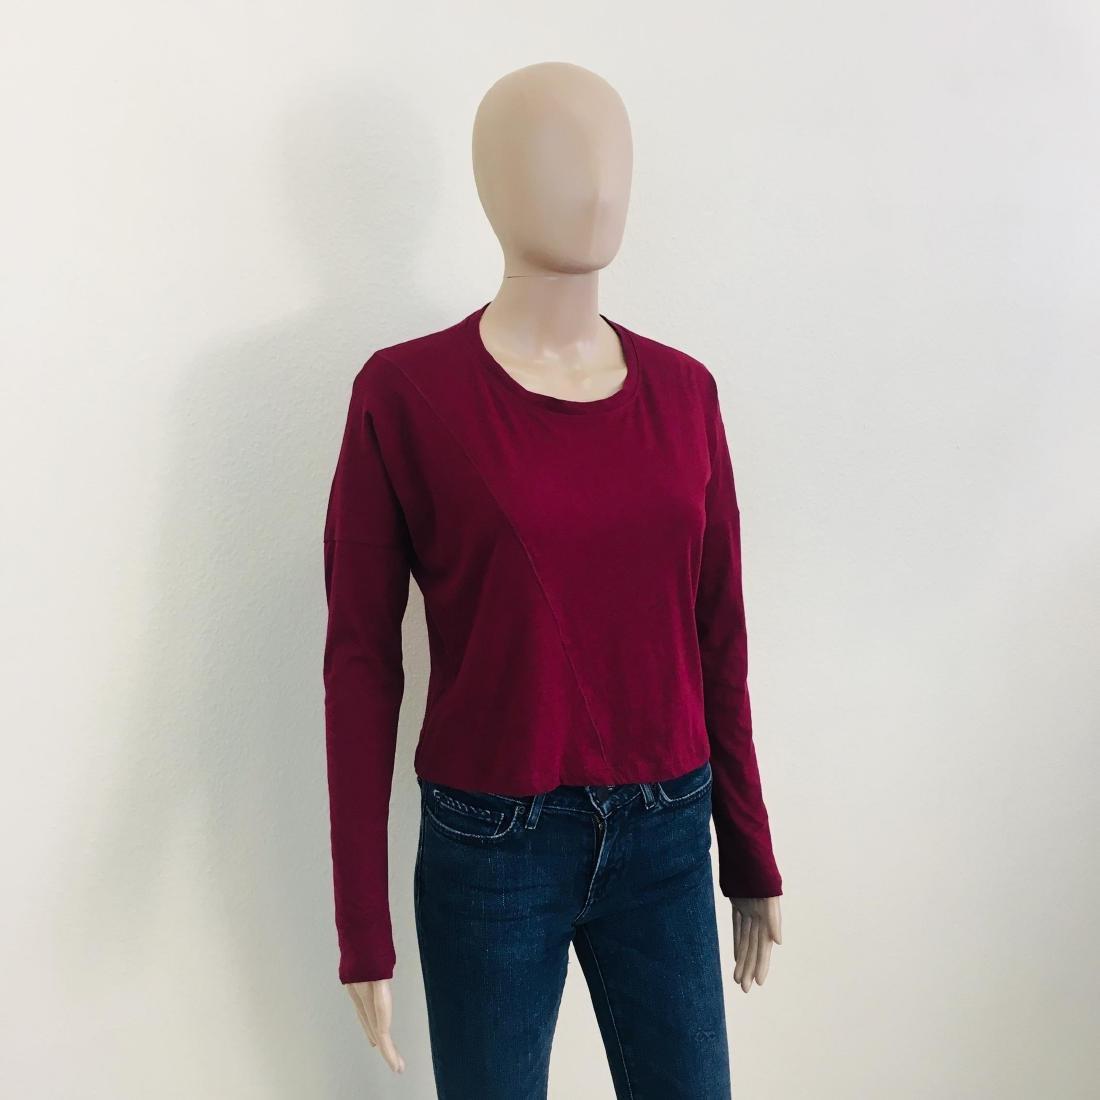 New Women's ZARA Top Blouse Size S - 3